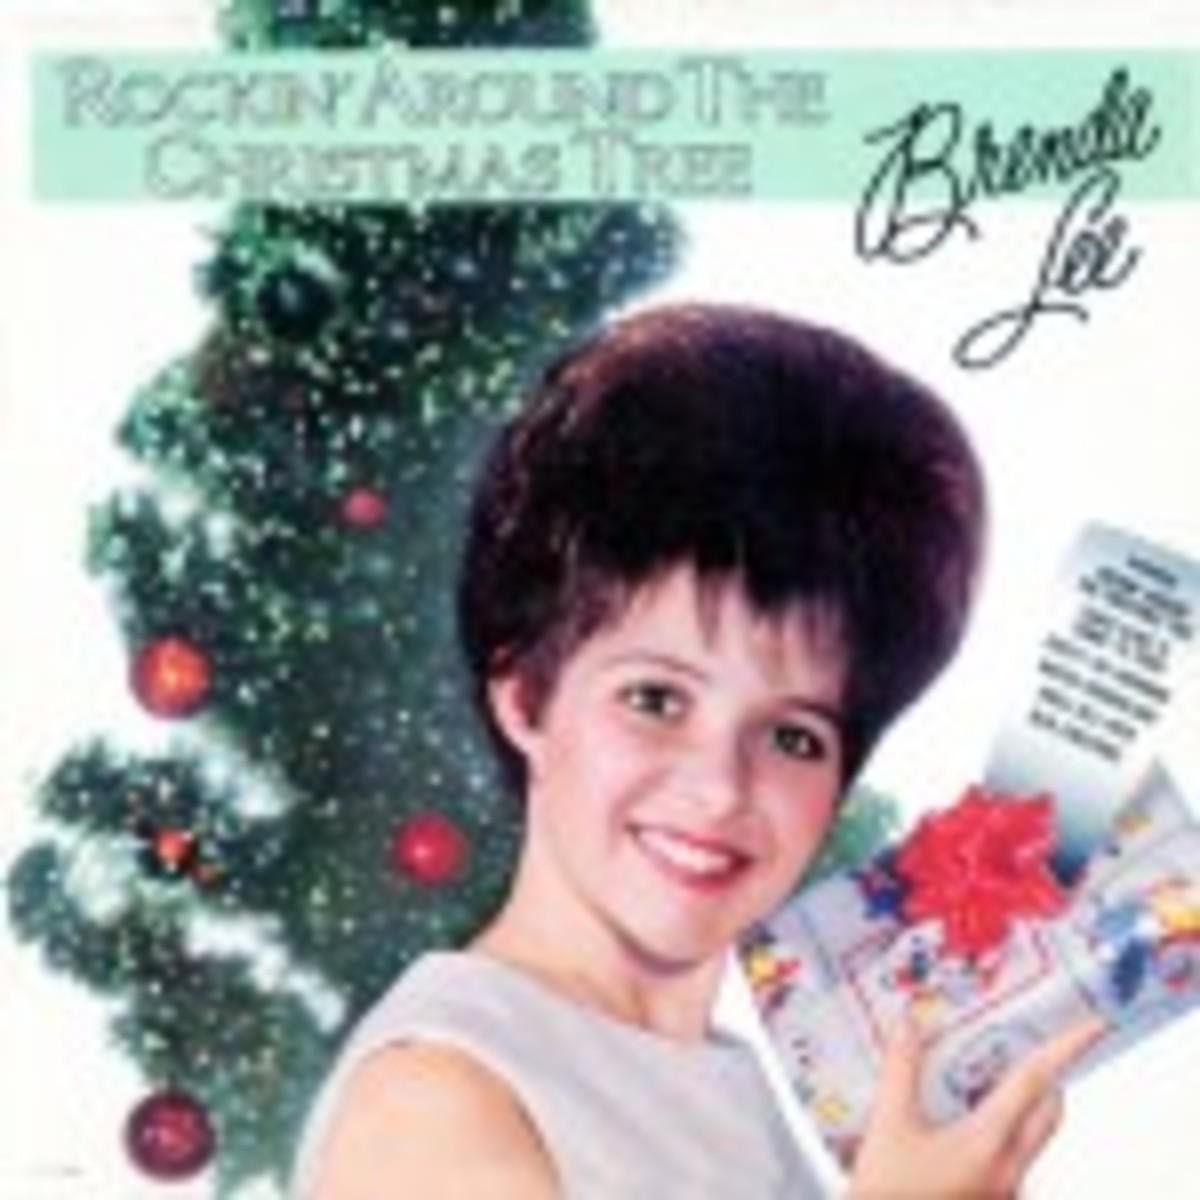 Brenda Lee Rcokin Around The Christmas Tree